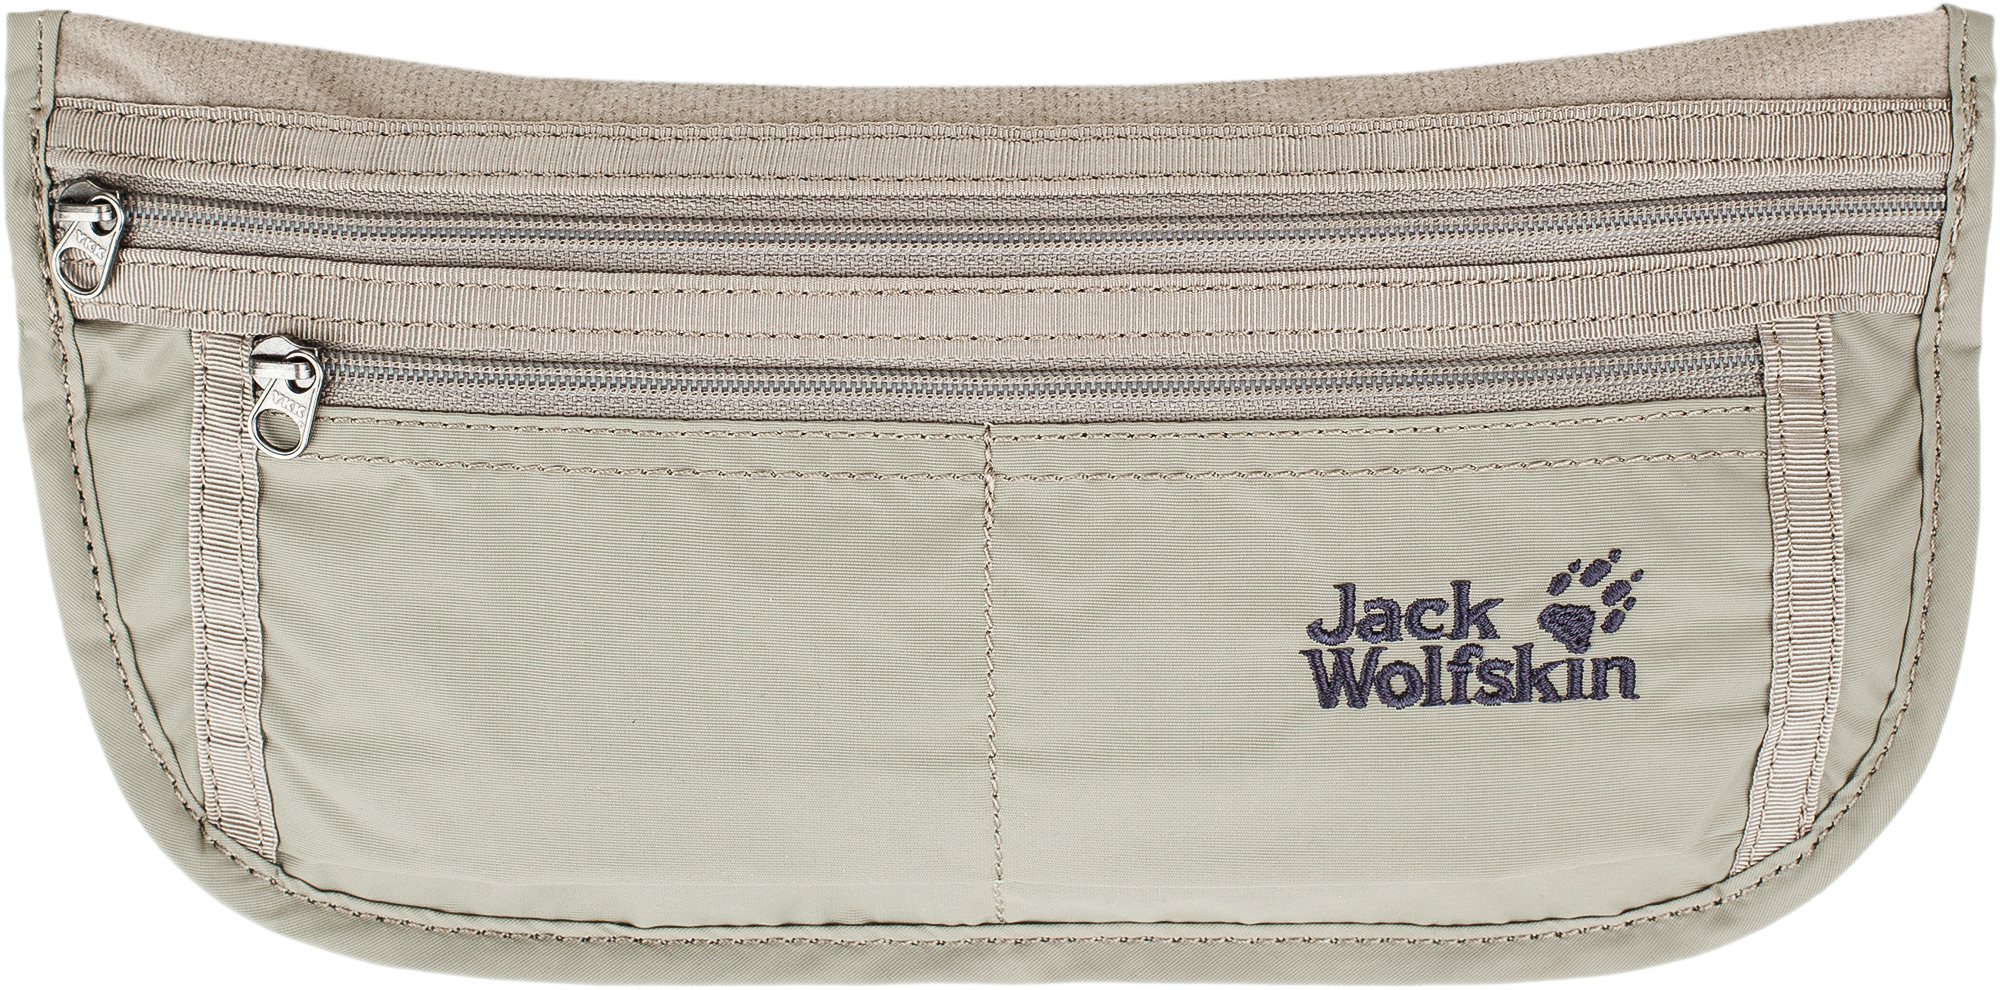 JACK WOLFSKIN Сумка для документов JACK WOLFSKIN недорго, оригинальная цена